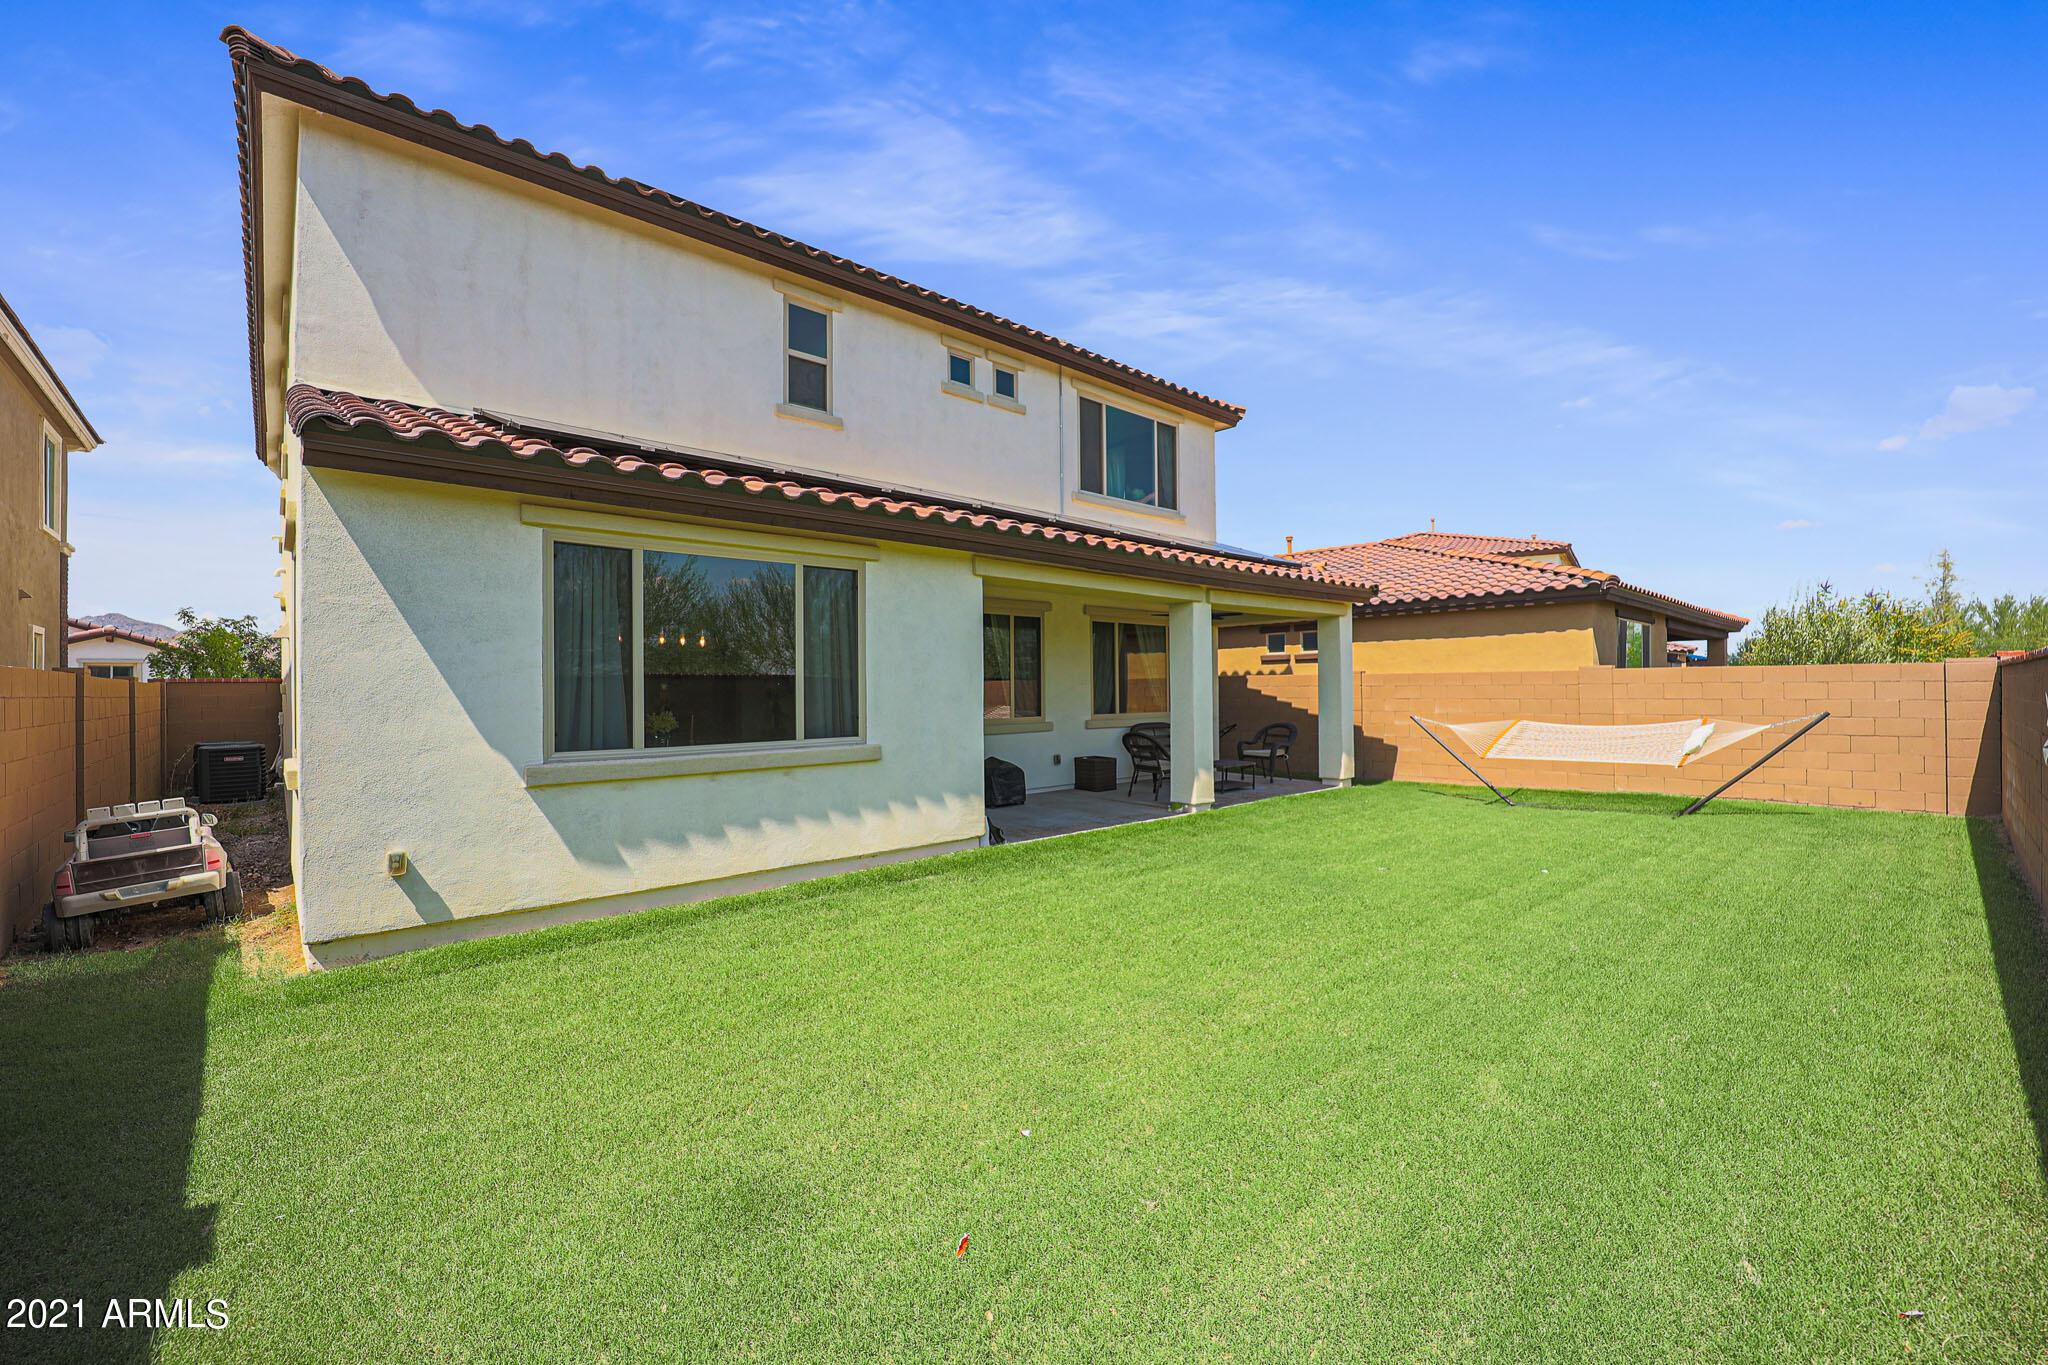 MLS 6272599 21047 W ALMERIA Road, Buckeye, AZ 85396 Buckeye AZ 5 or More Bedroom